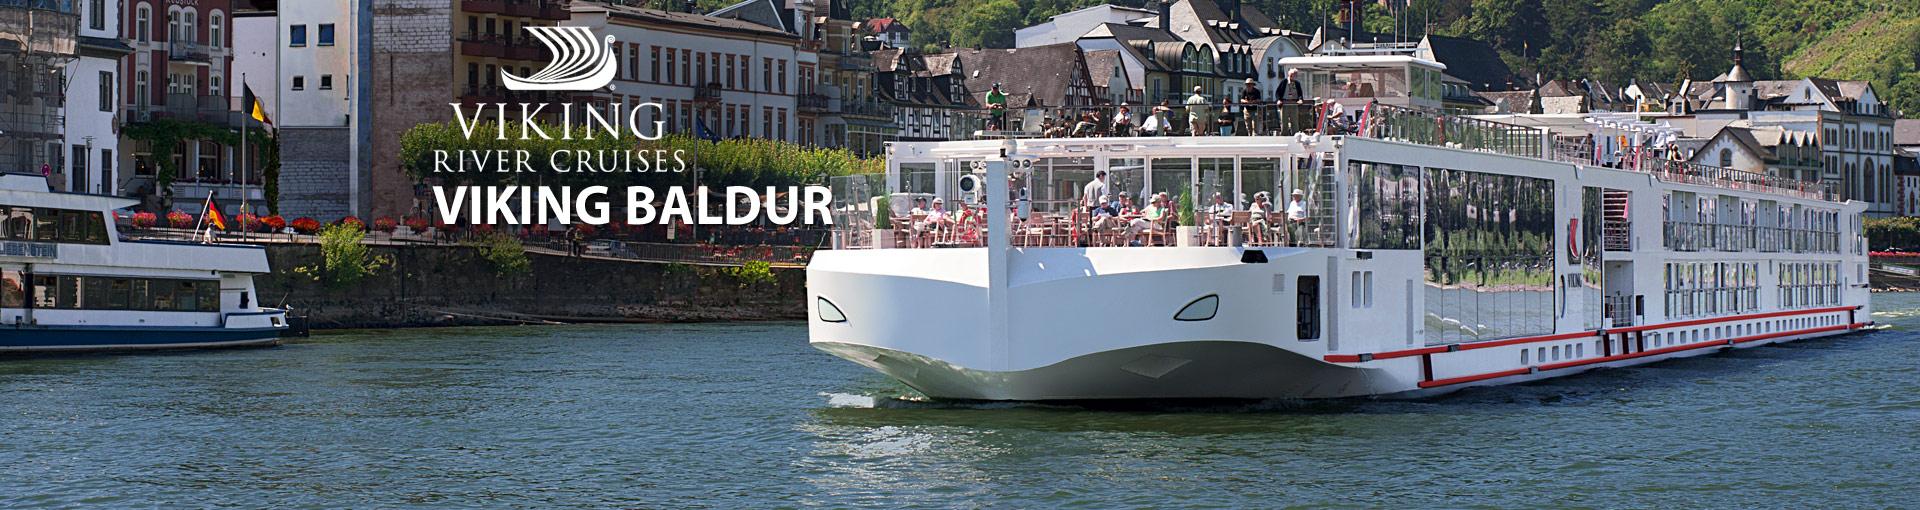 Viking Rivers Viking Baldur river cruise ship